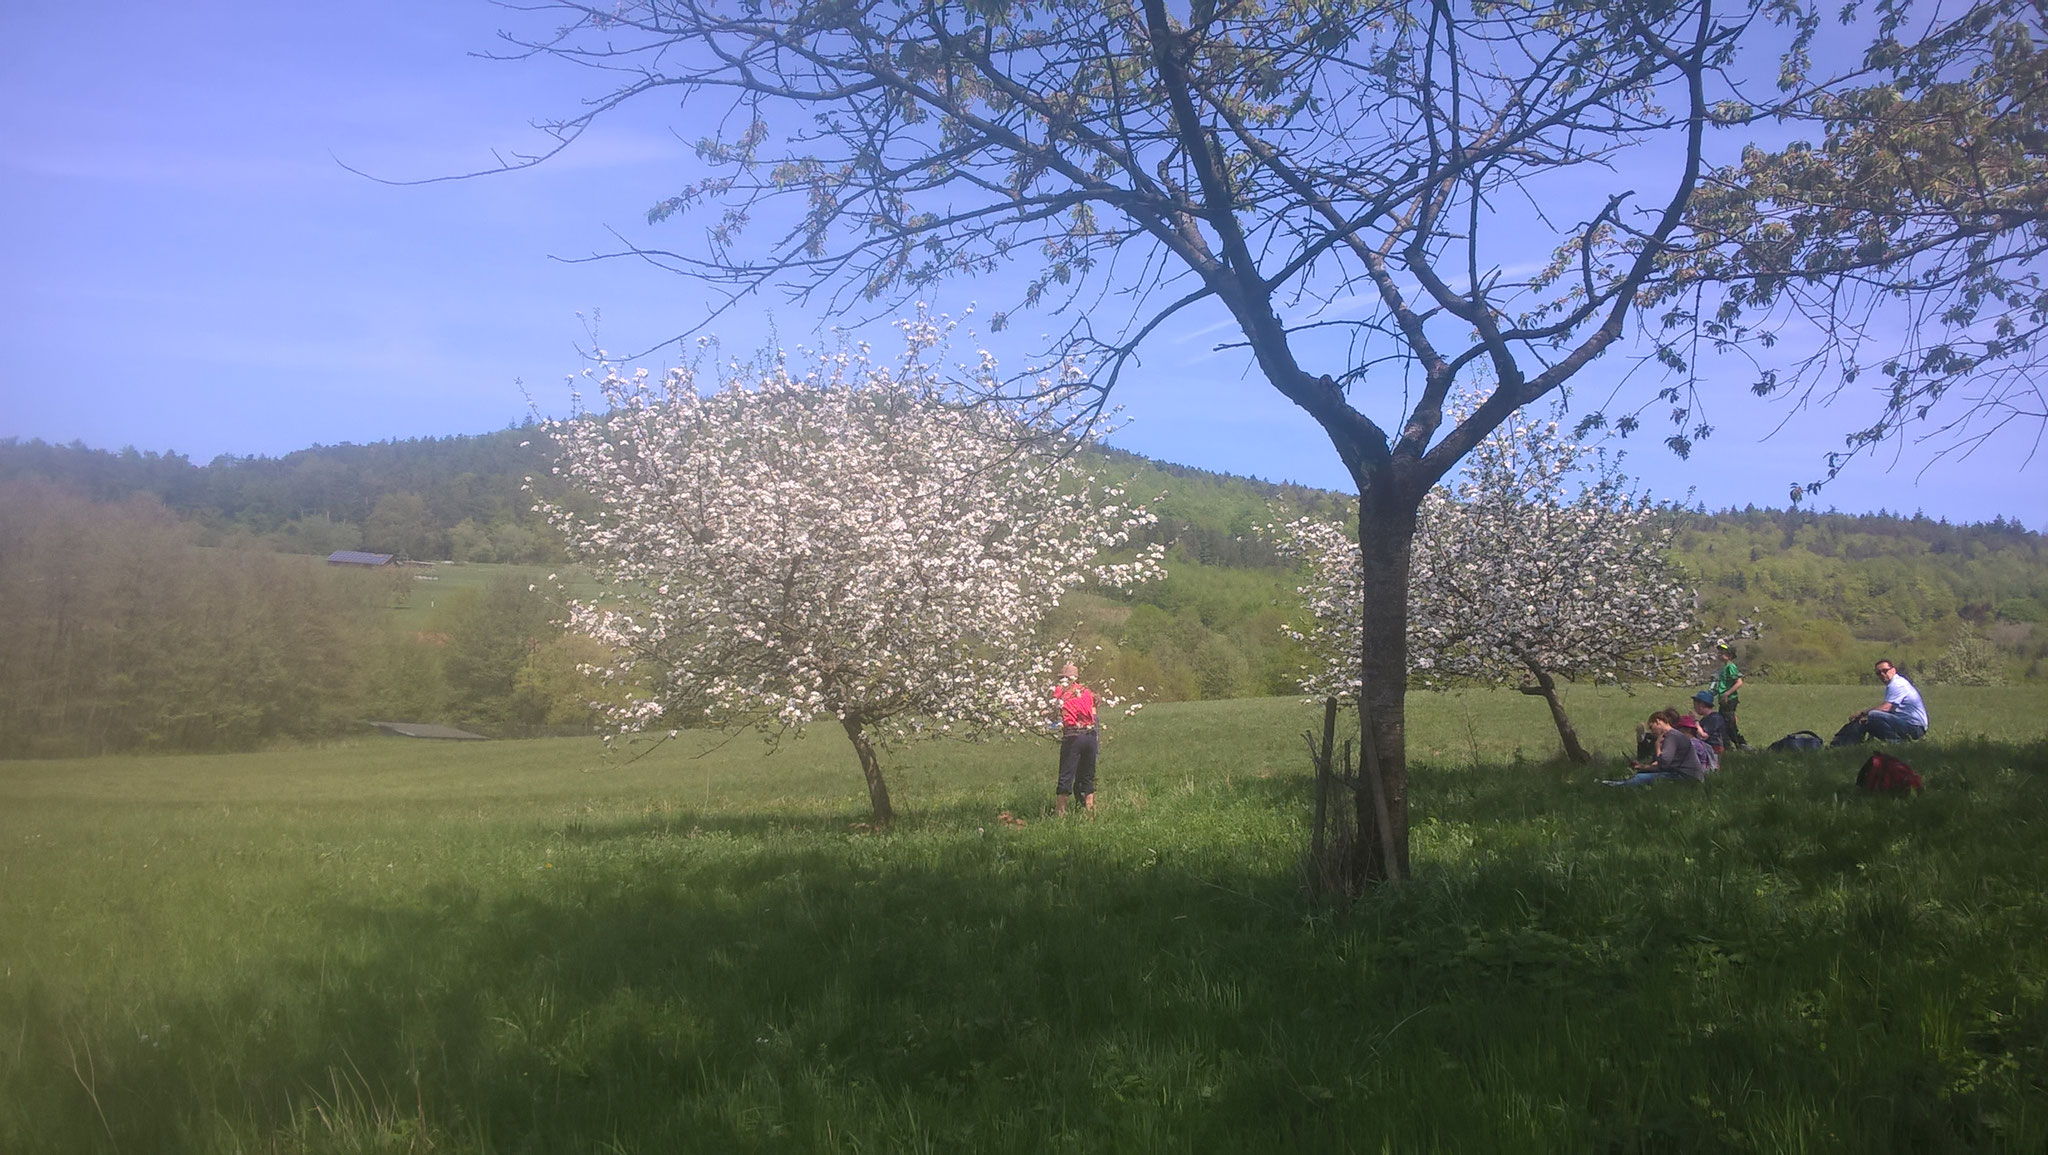 Blühende Apfelbäume. Foto: R. Nagel-Kroll